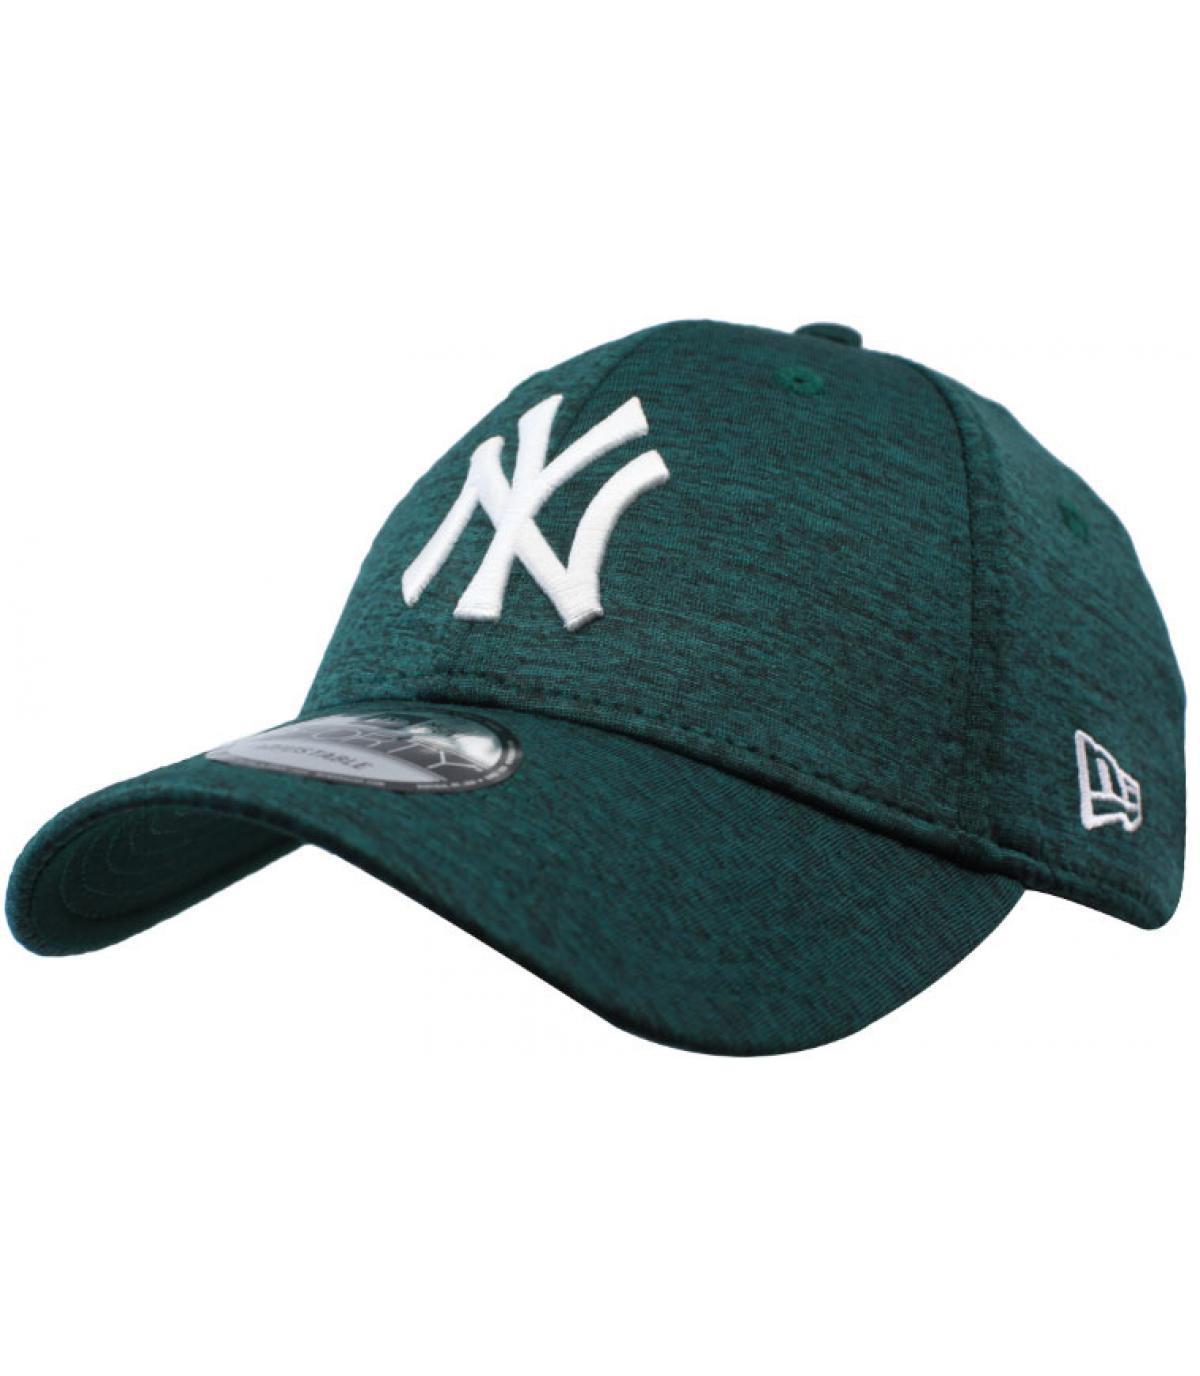 Dettagli Dry Switch NY 9Forty dark green - image 2